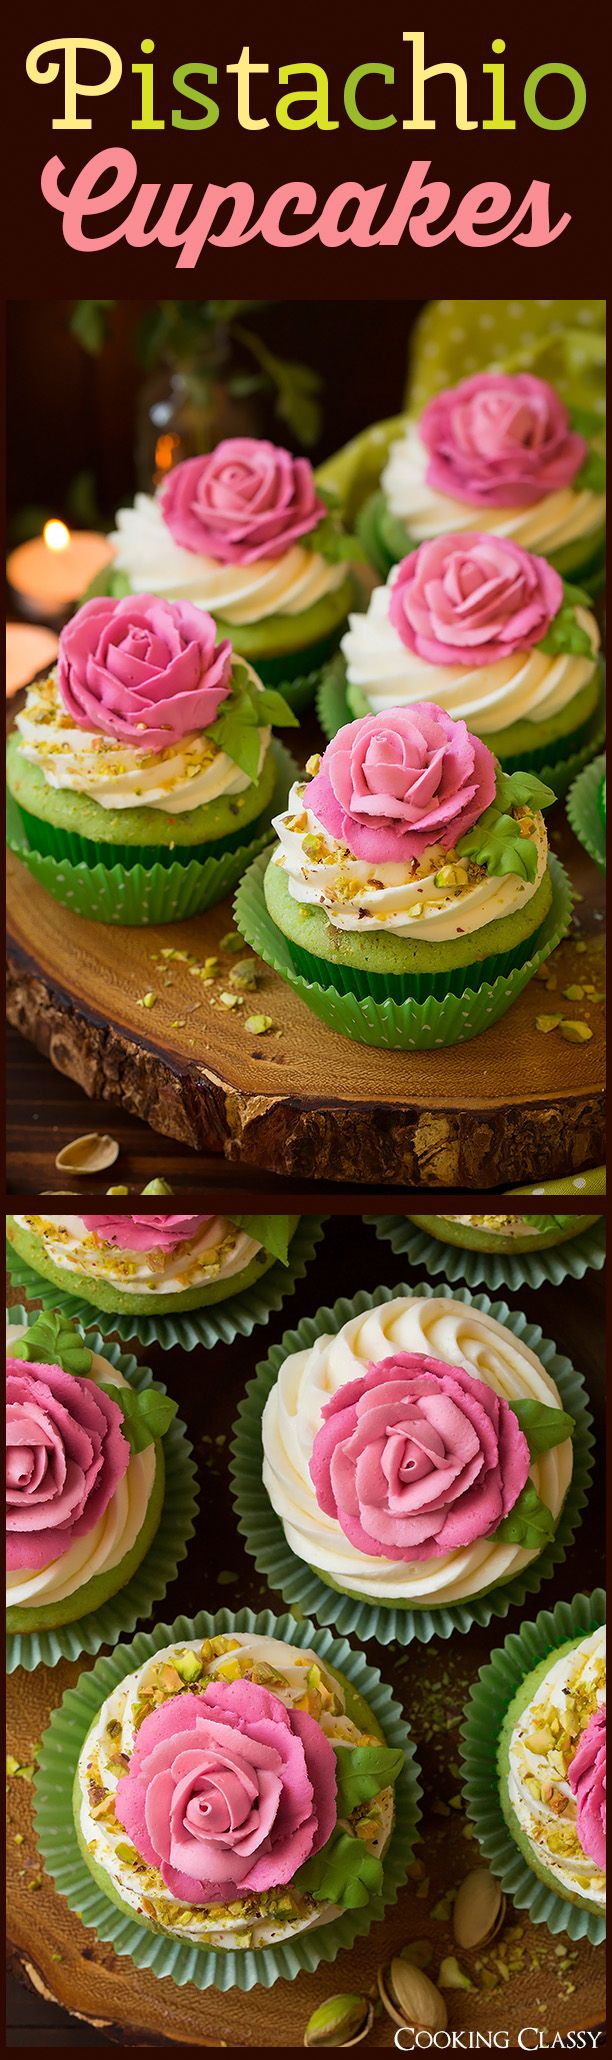 Pistachio Cupcakes - Cooking Classy                                                                                                                                                                                 More